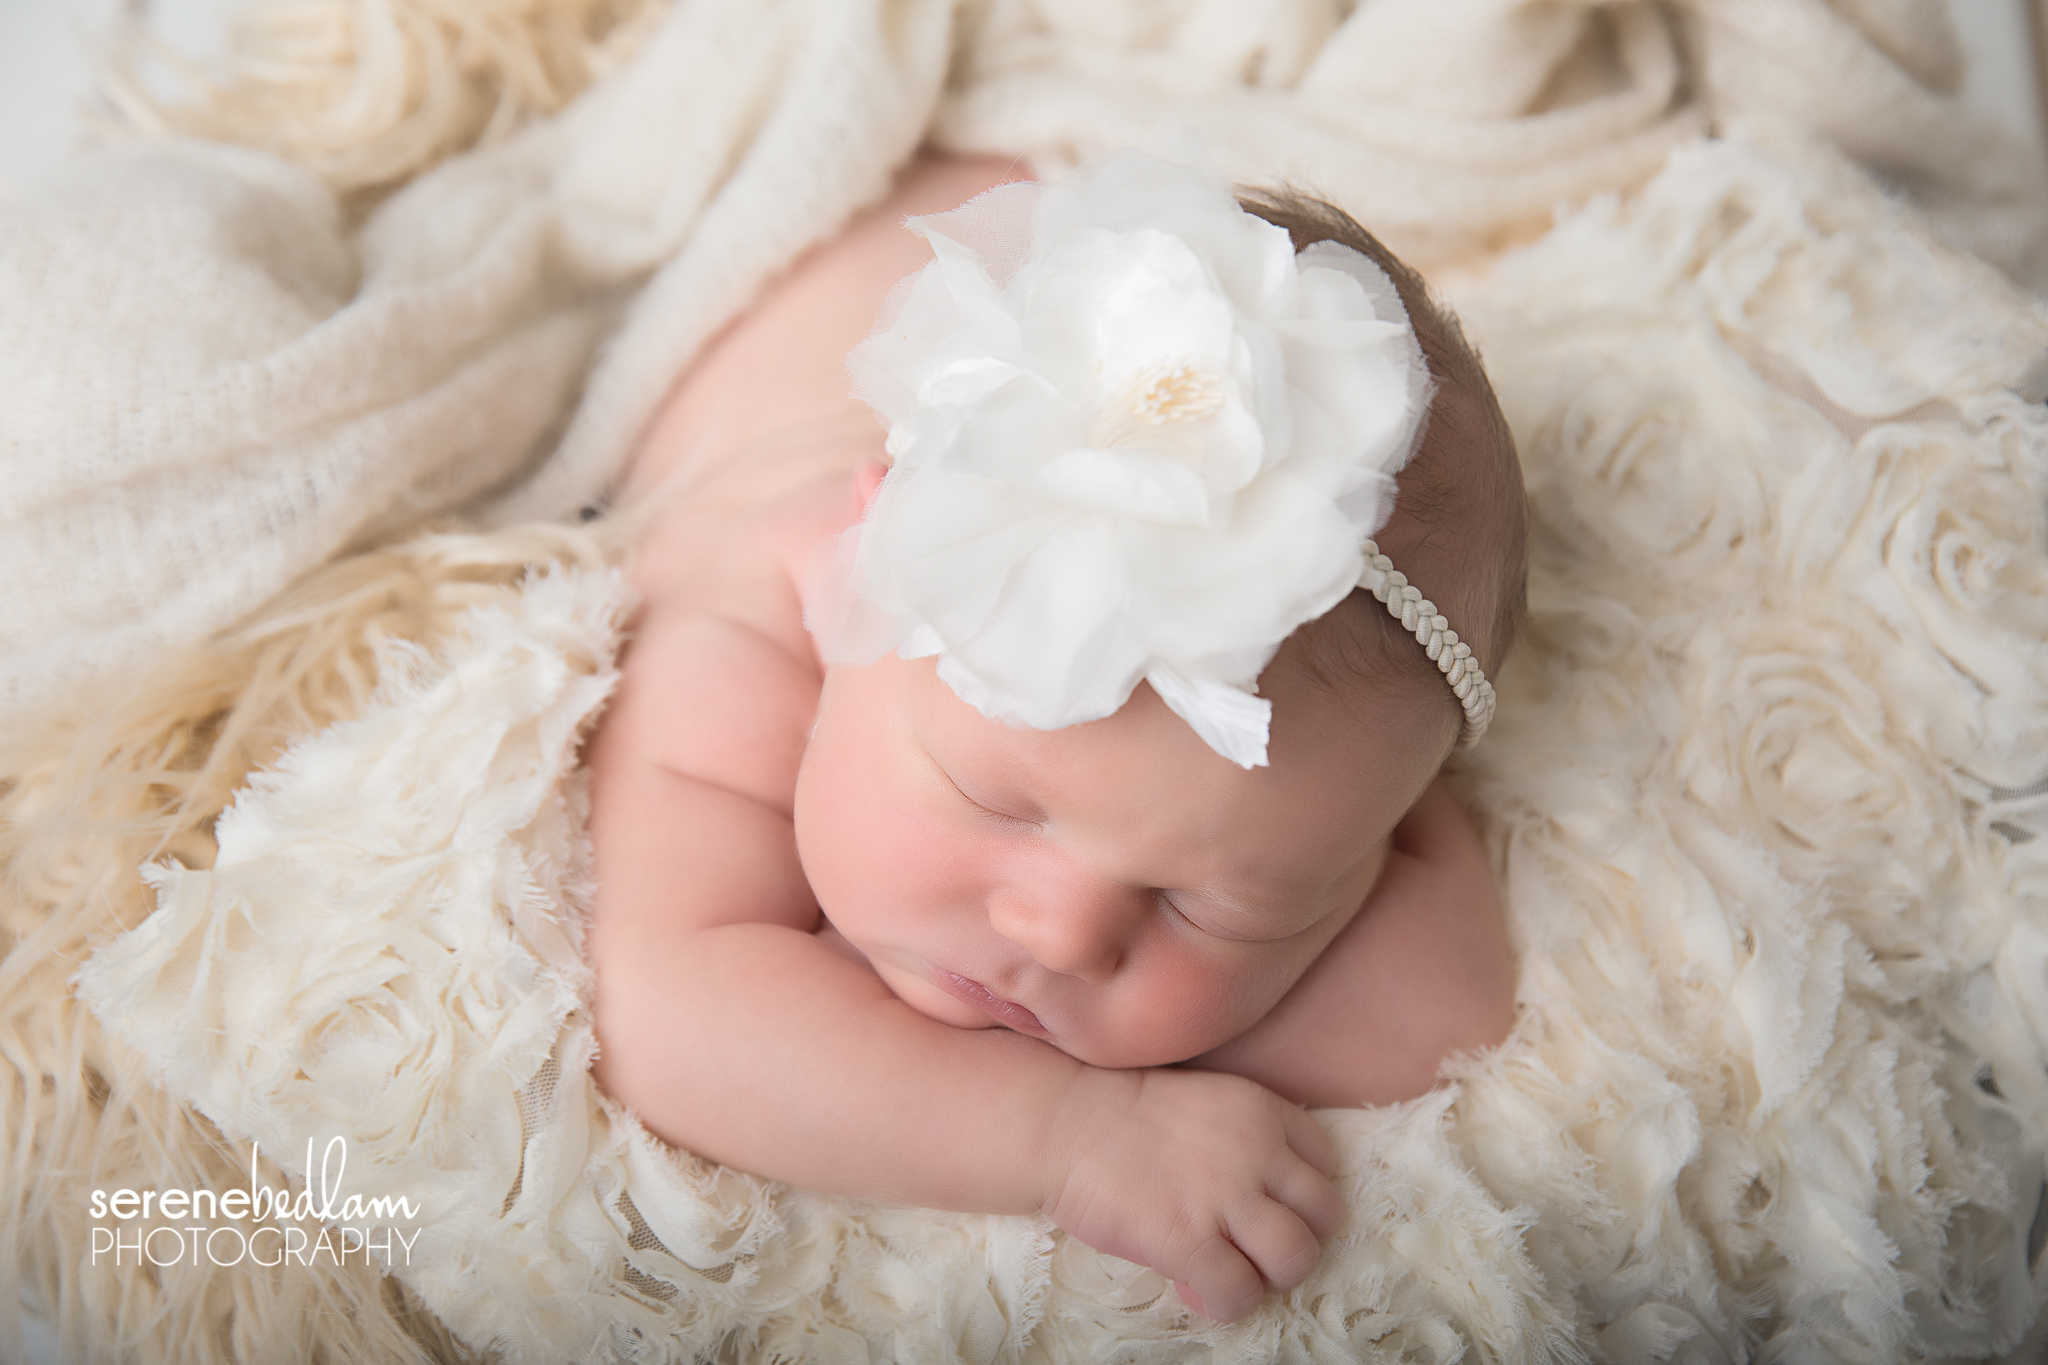 Serene Bedlam Newman Newborn Baby Photography - Milla